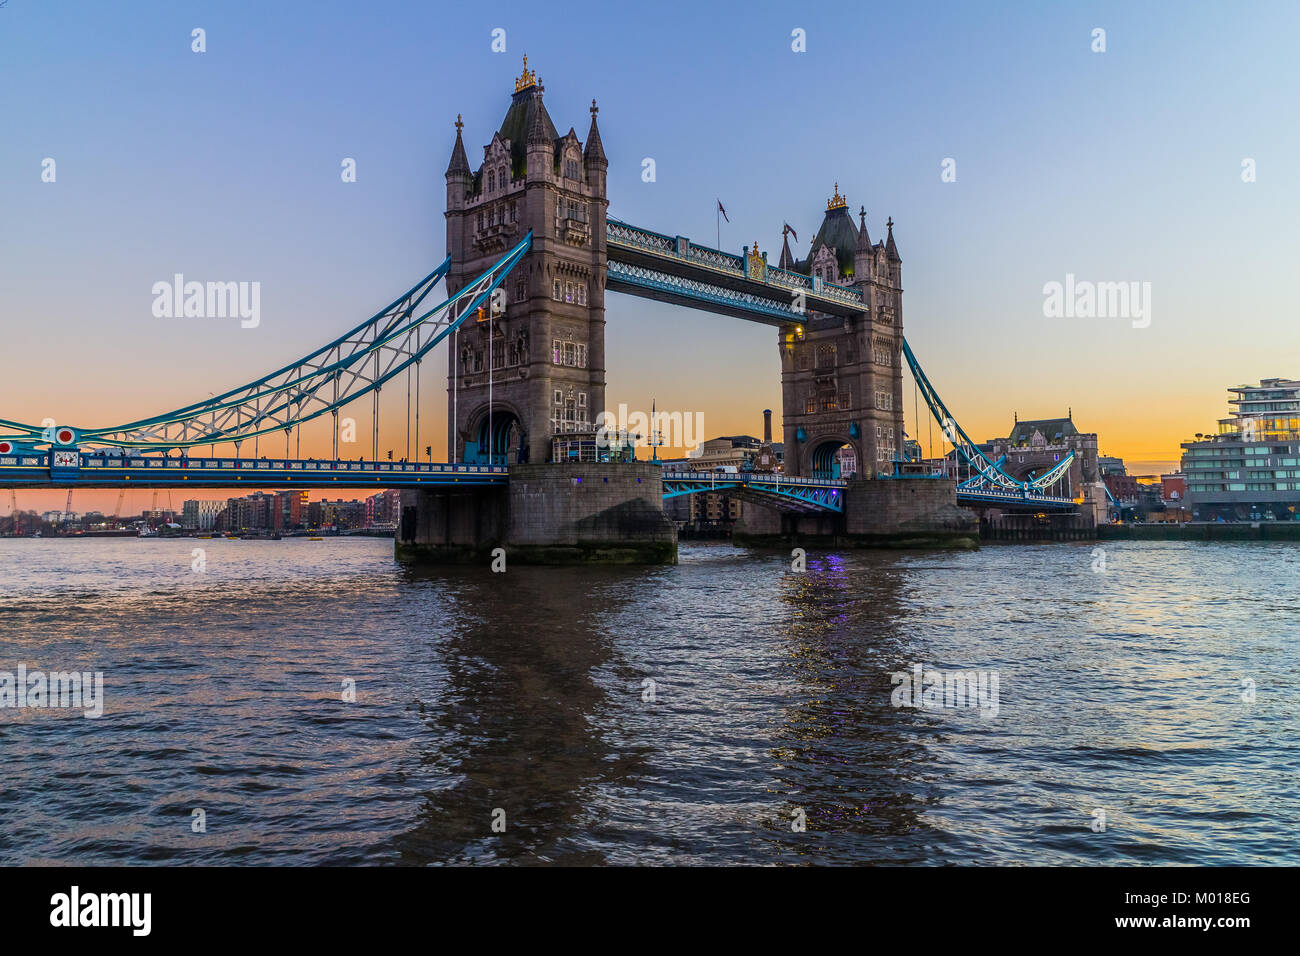 Tower Bridge, River Thames, London. Stock Photo